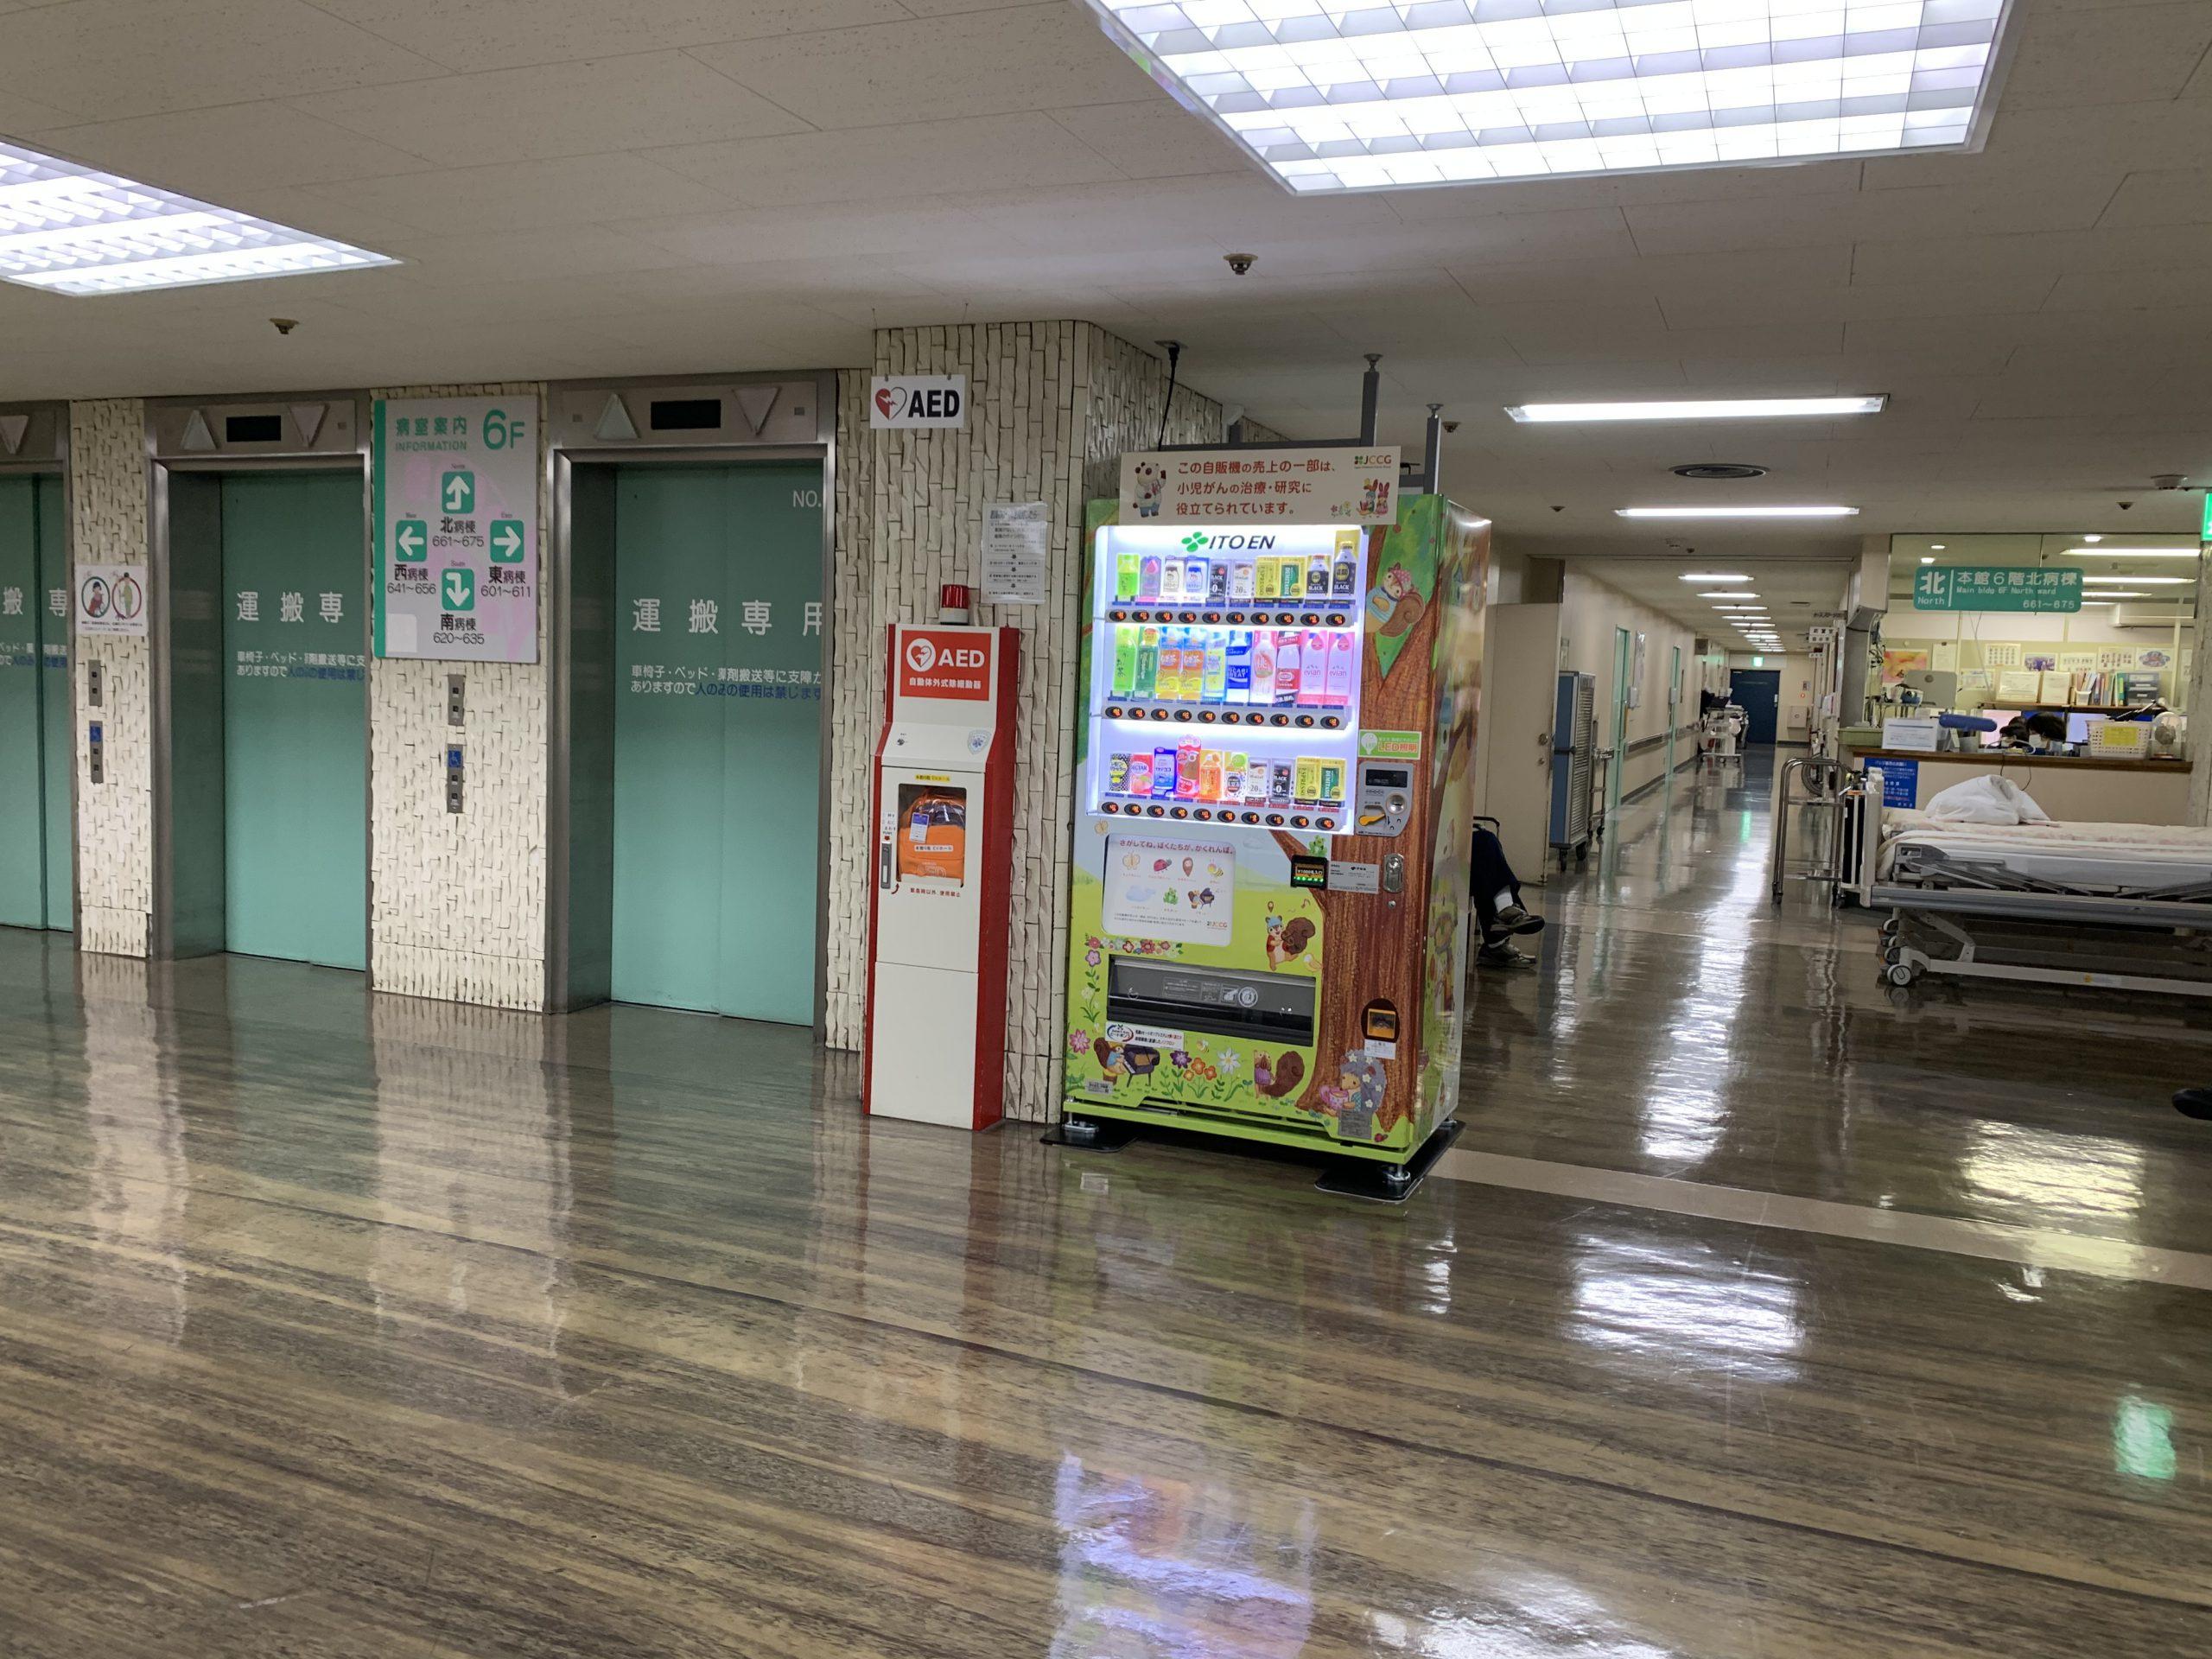 【聖マリアンナ医科大学病院】 (神奈川県) 6階小児科